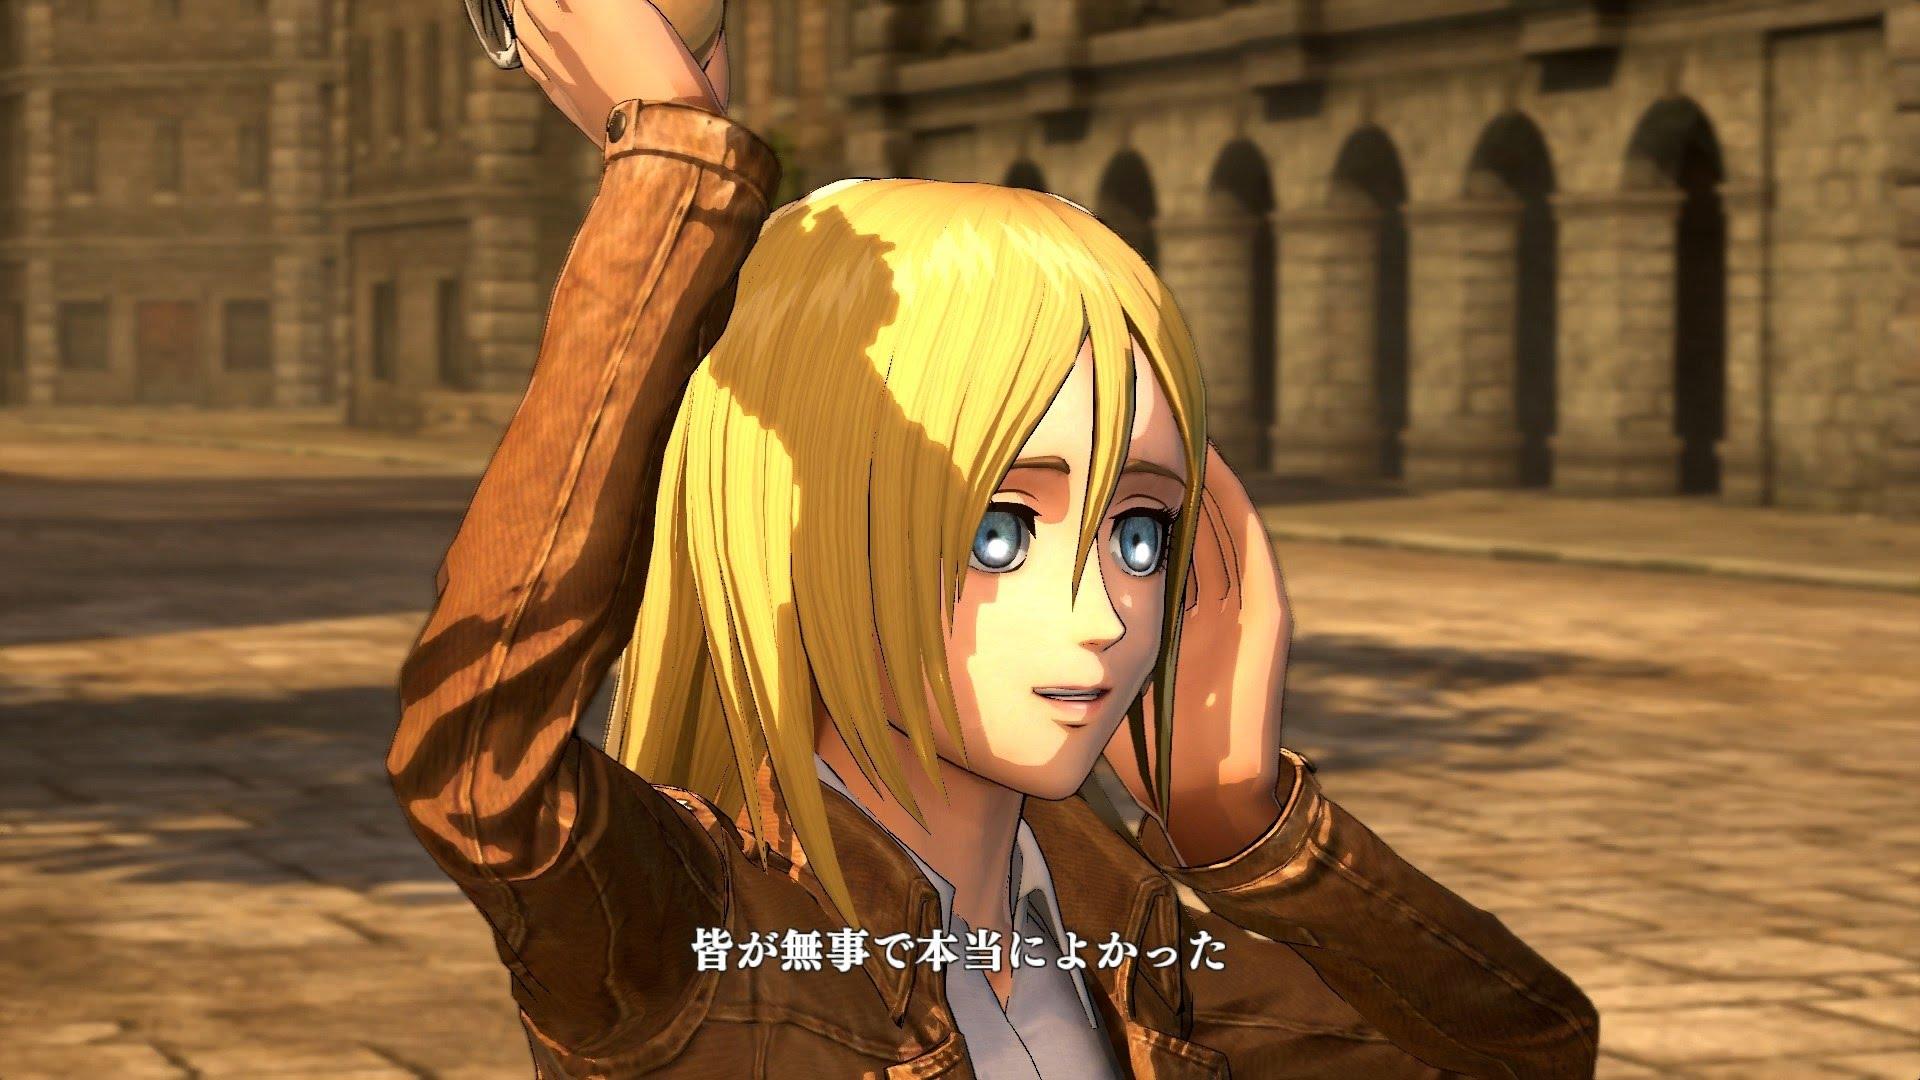 Historia Attack On Titan Game Historia 1122498 Hd Wallpaper Backgrounds Download